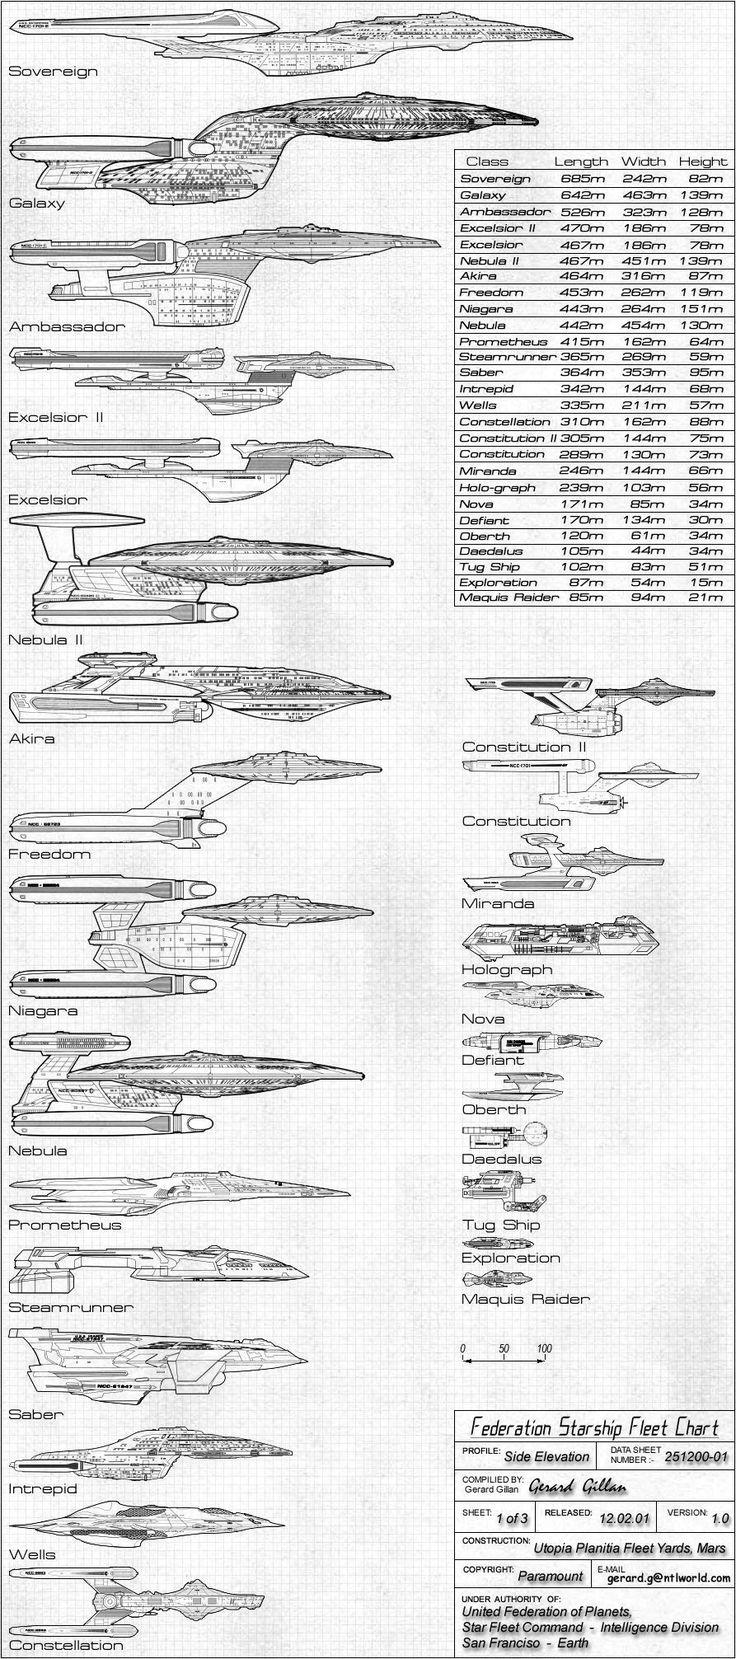 Federation Starship Fleet Chart